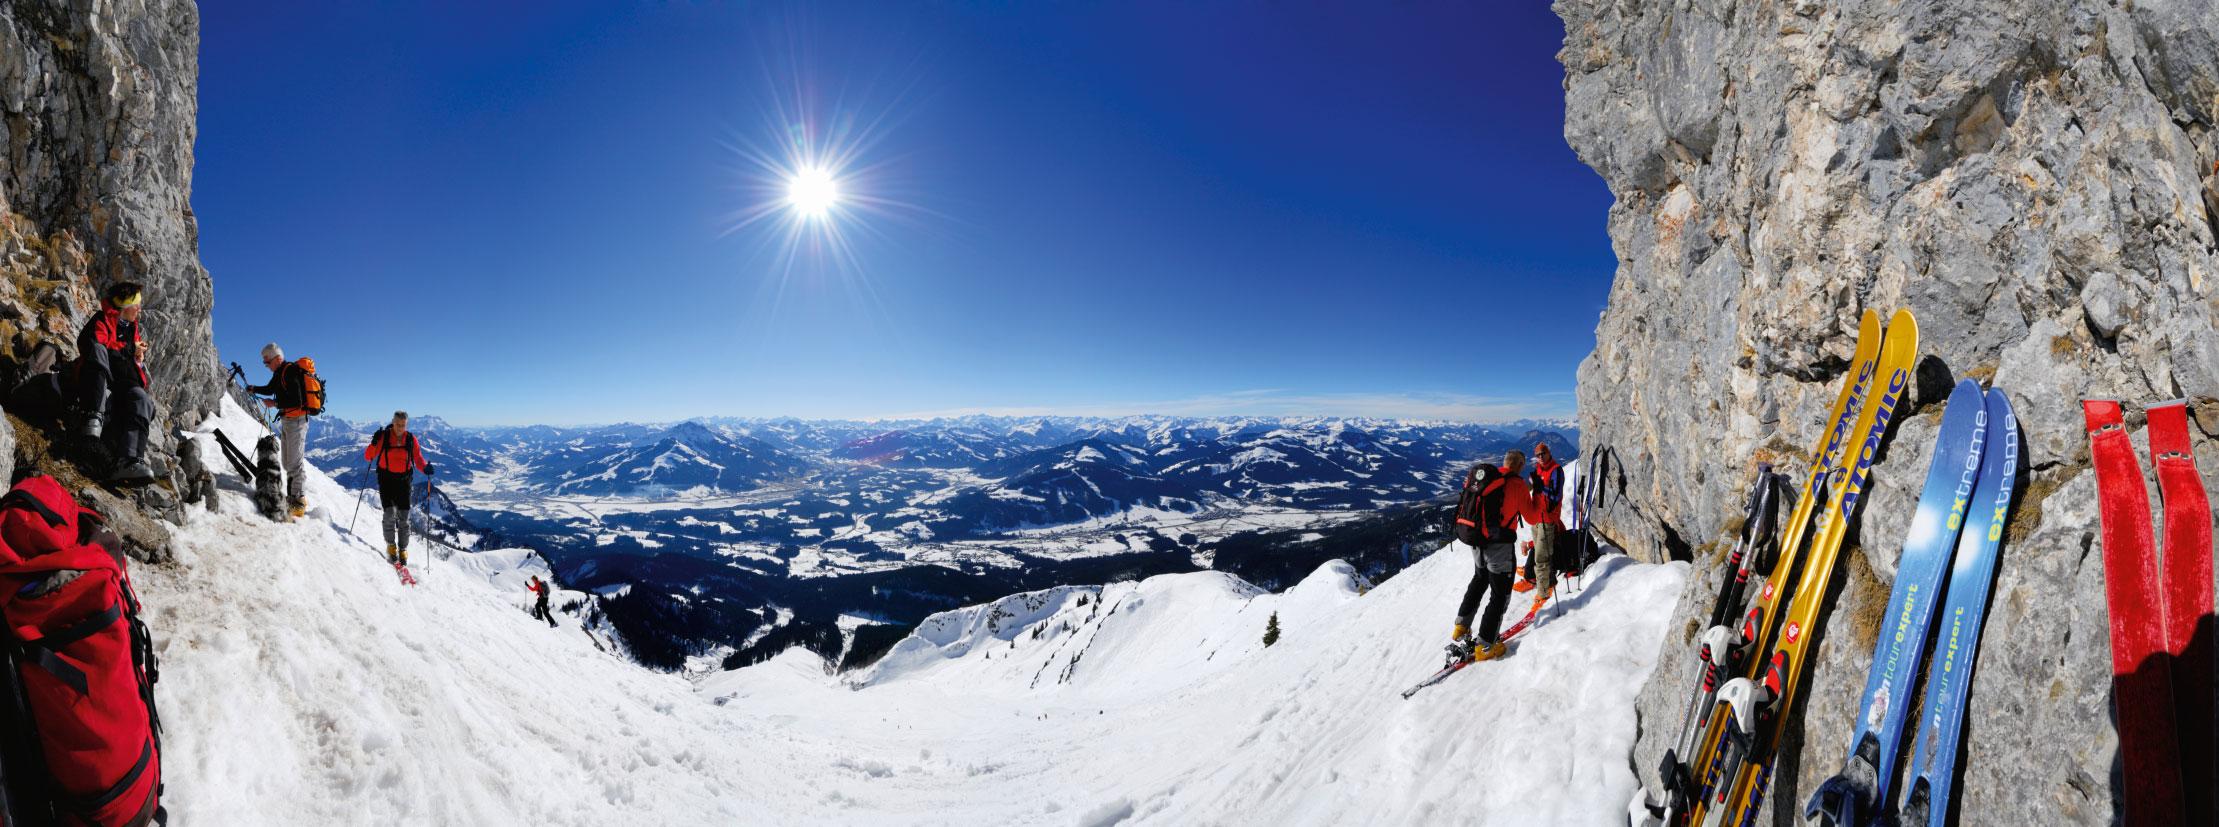 Skitouren im Kaisergebirge